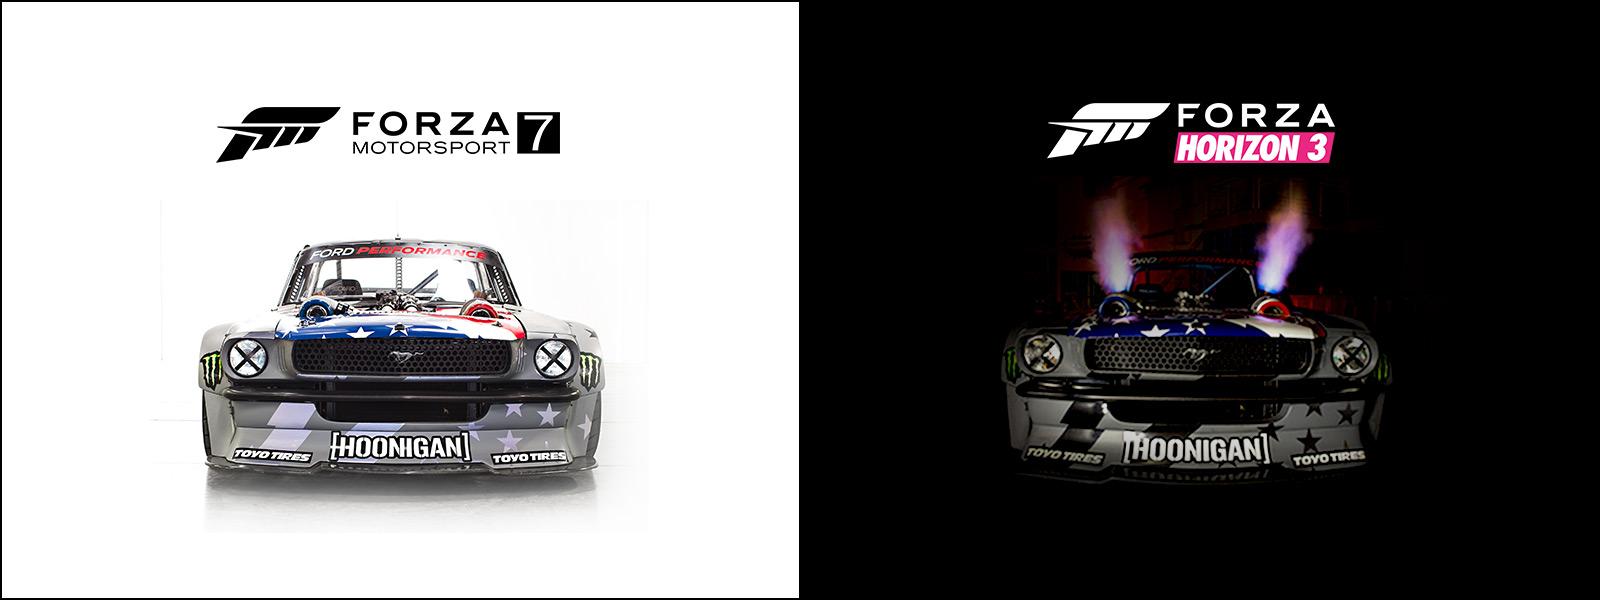 Forza 7 - Hooligan